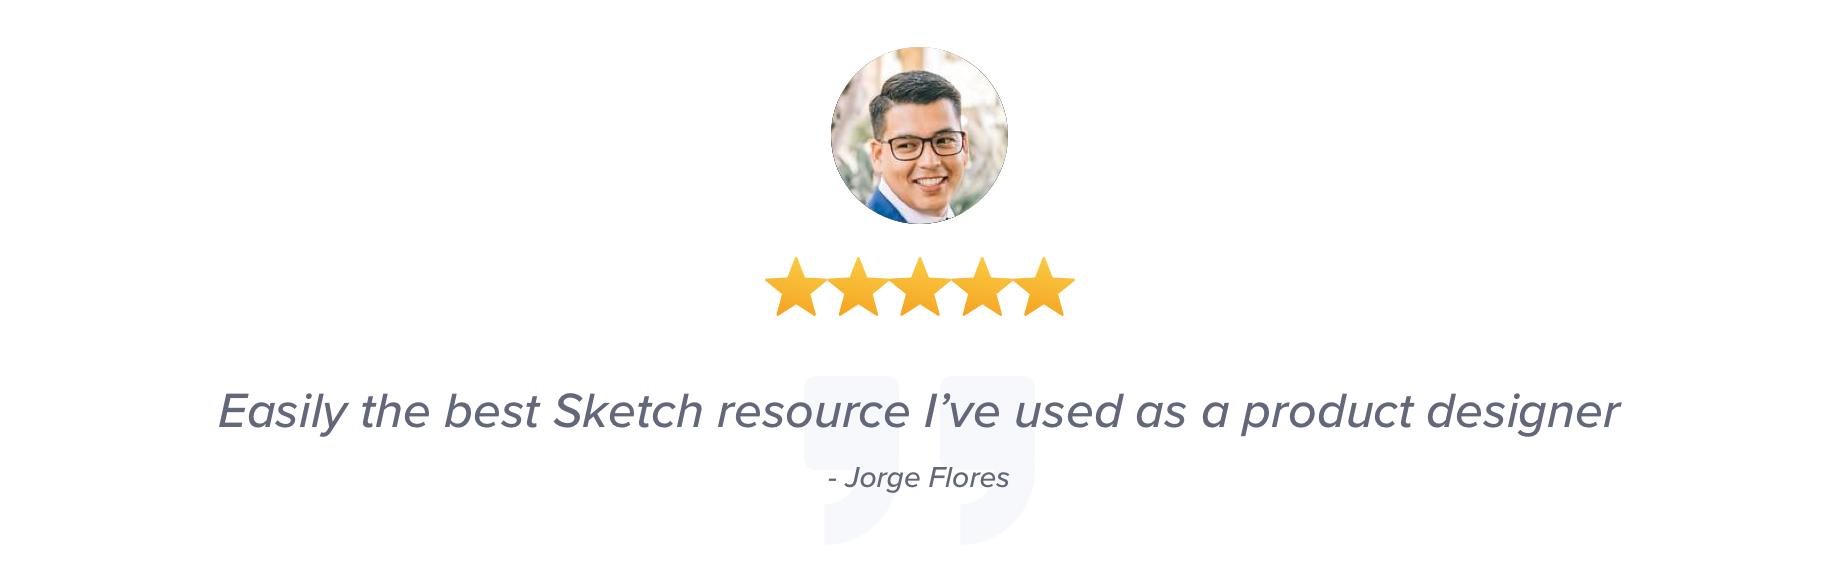 Reviews - Jorge.jpg